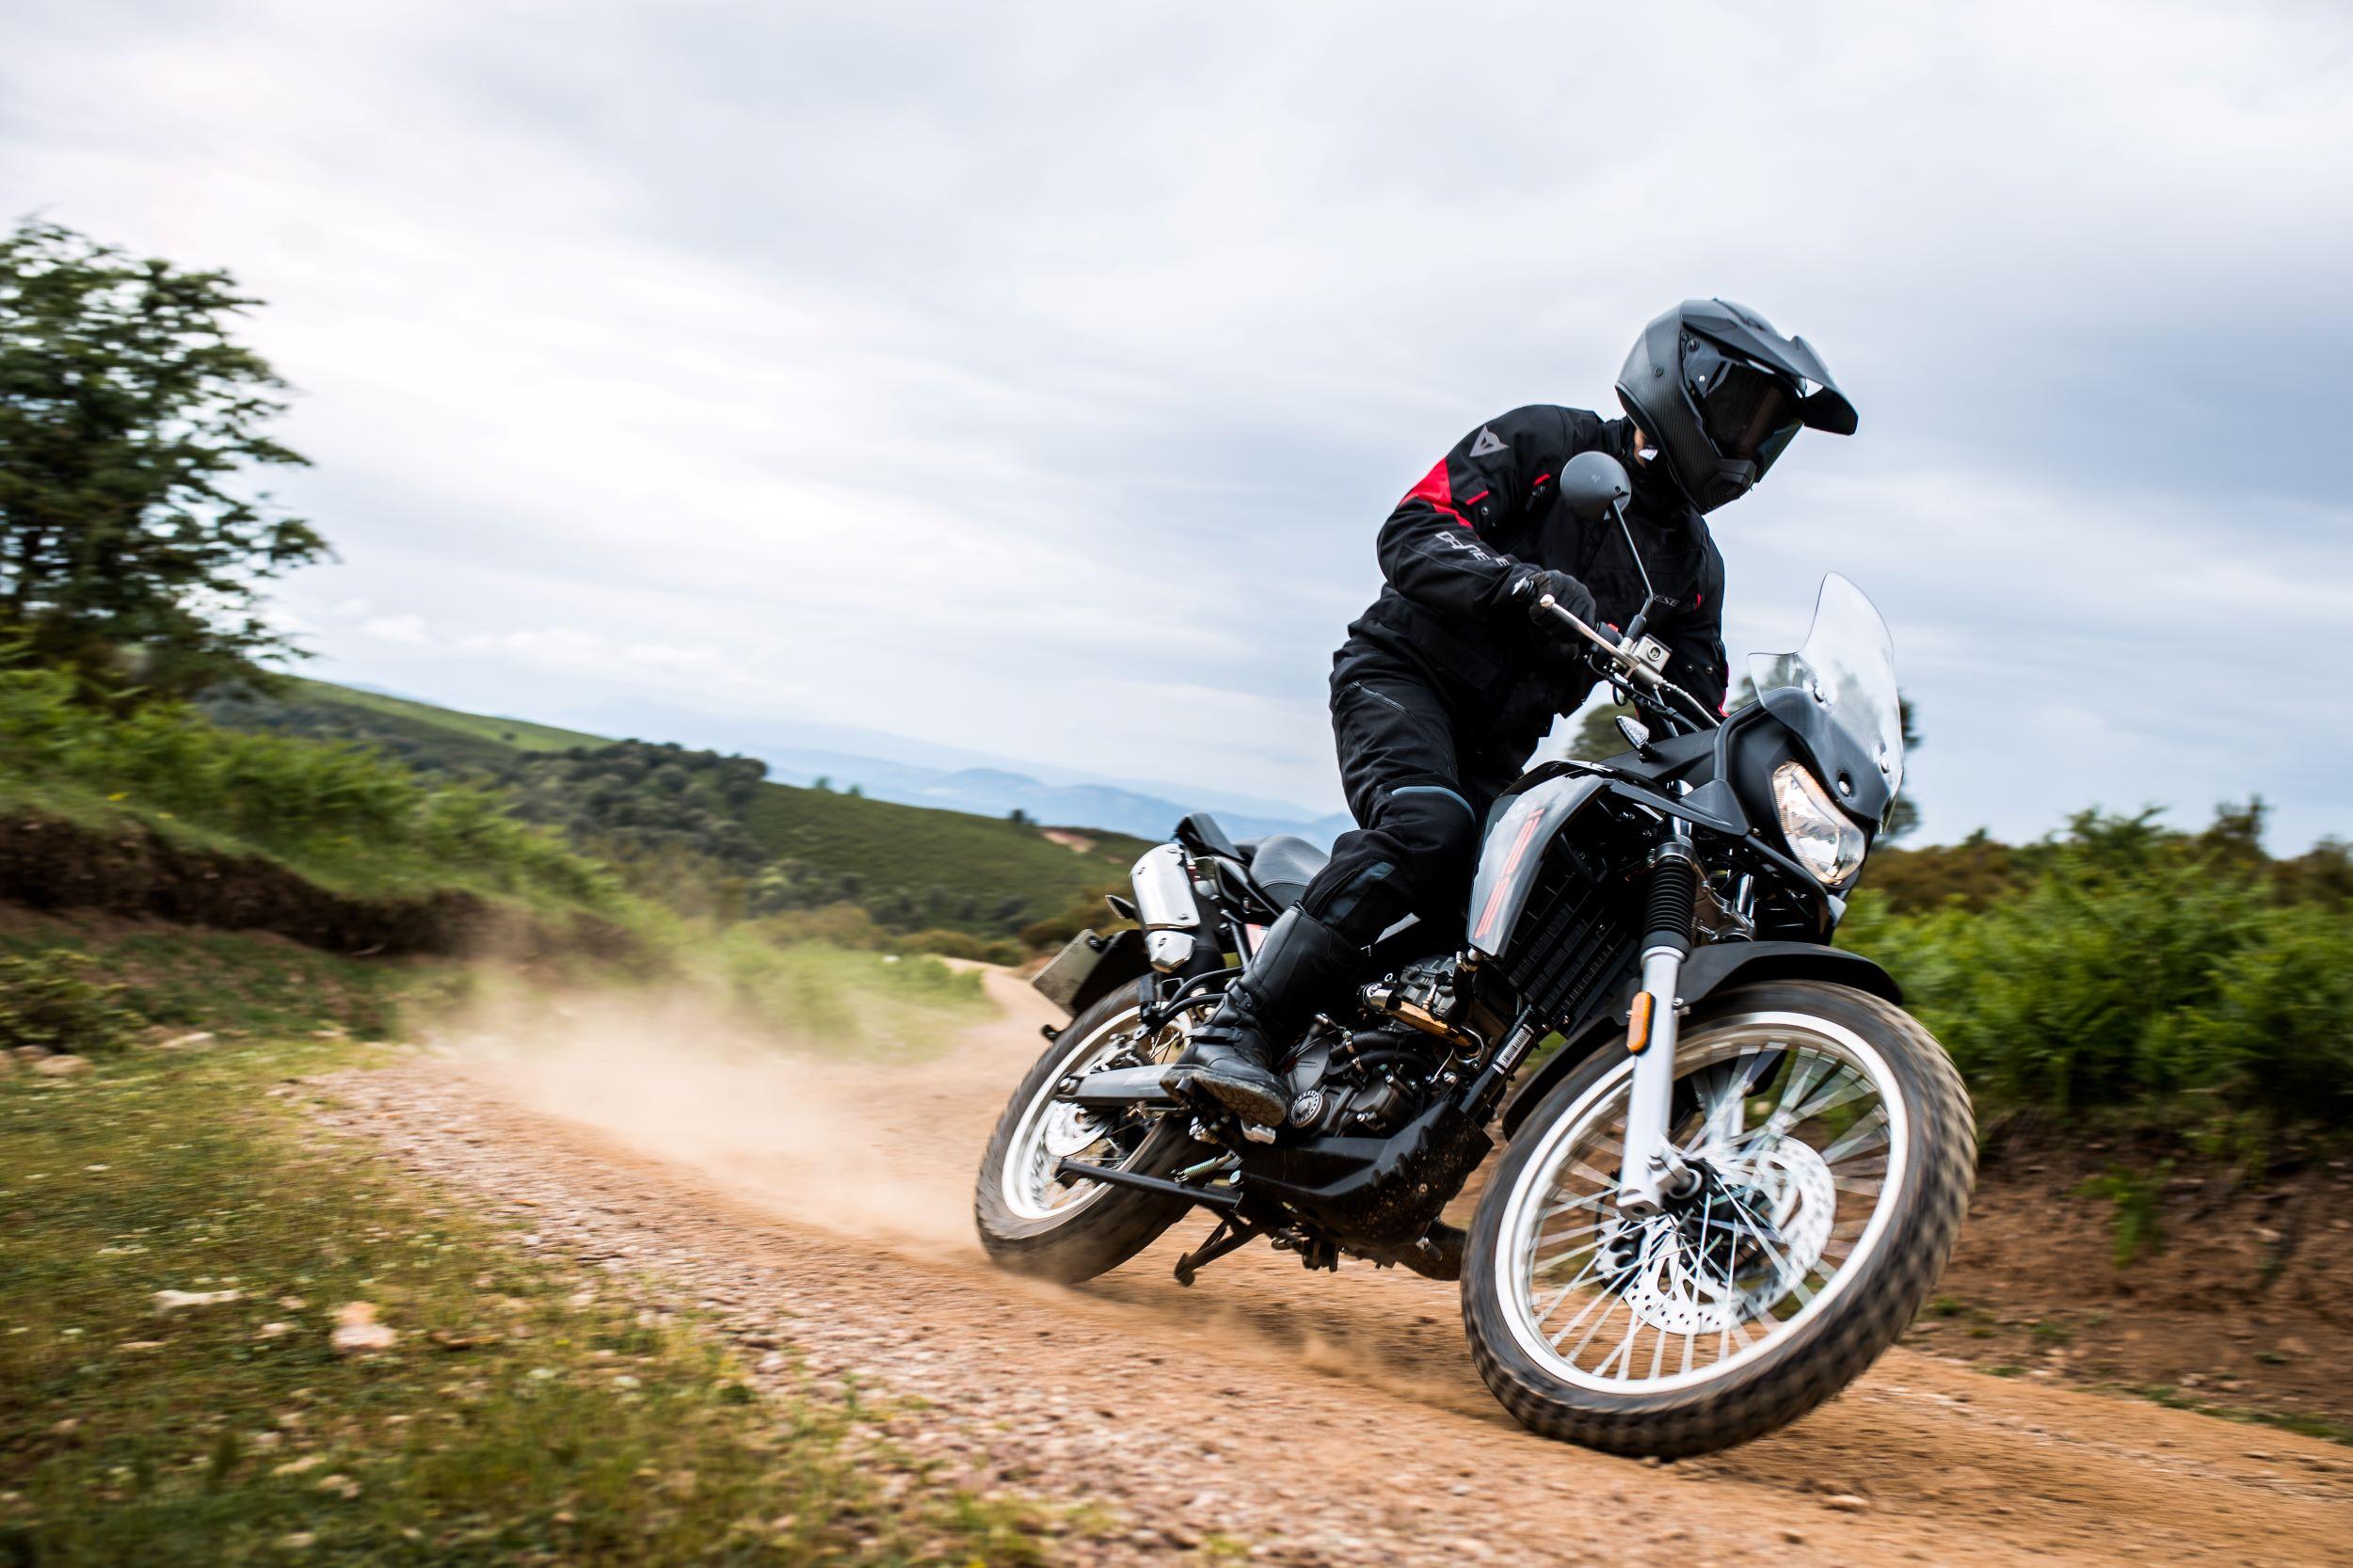 https://malaguti.bike/wp-content/uploads/sites/3/2021/08/dune-x-right-side-action.jpg